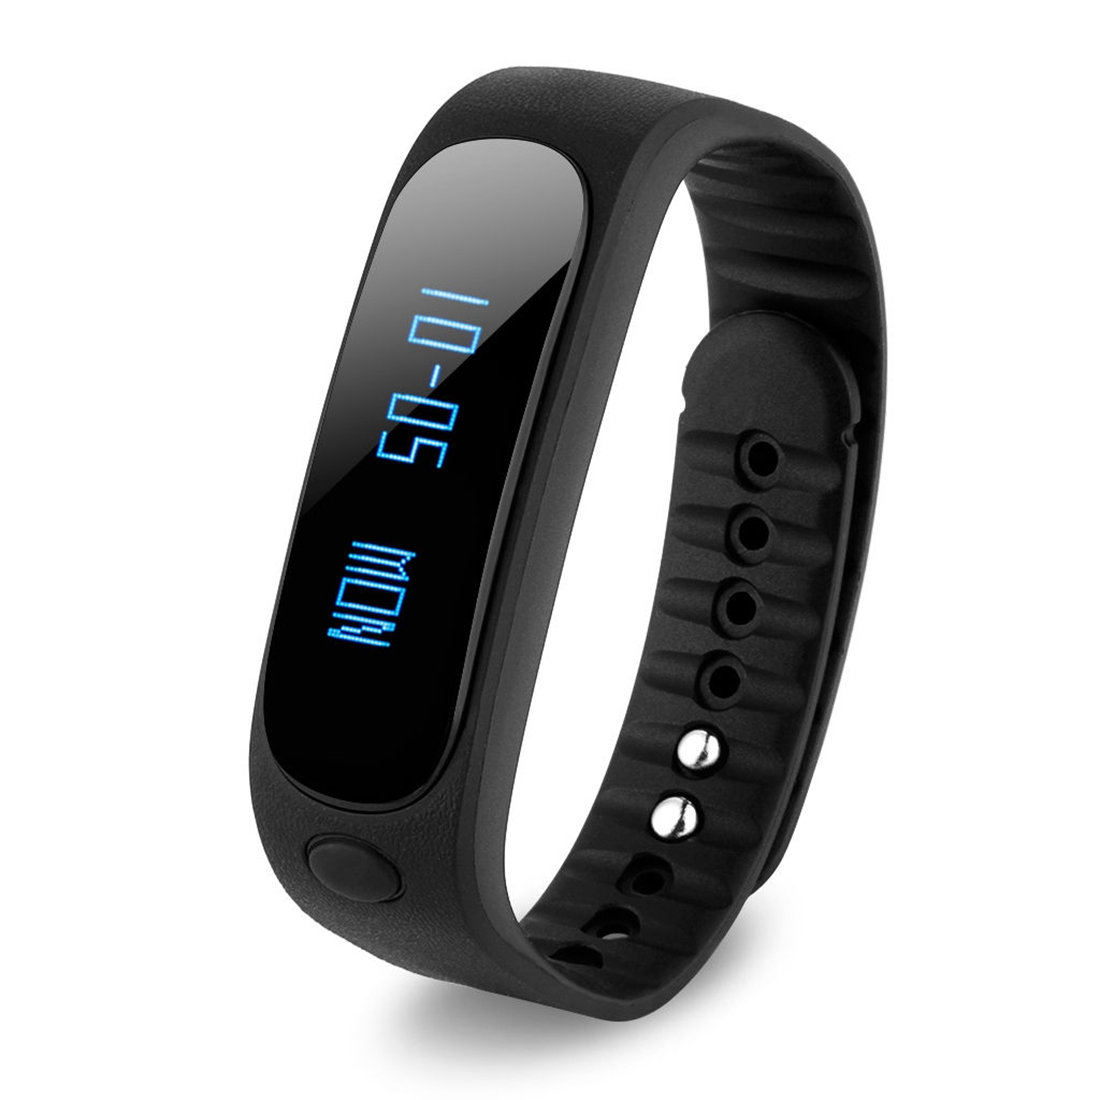 Bluetooth 4 0 Smart font b Watch b font Wristband Health Bracelet Sport Sleep Fitness Tracker